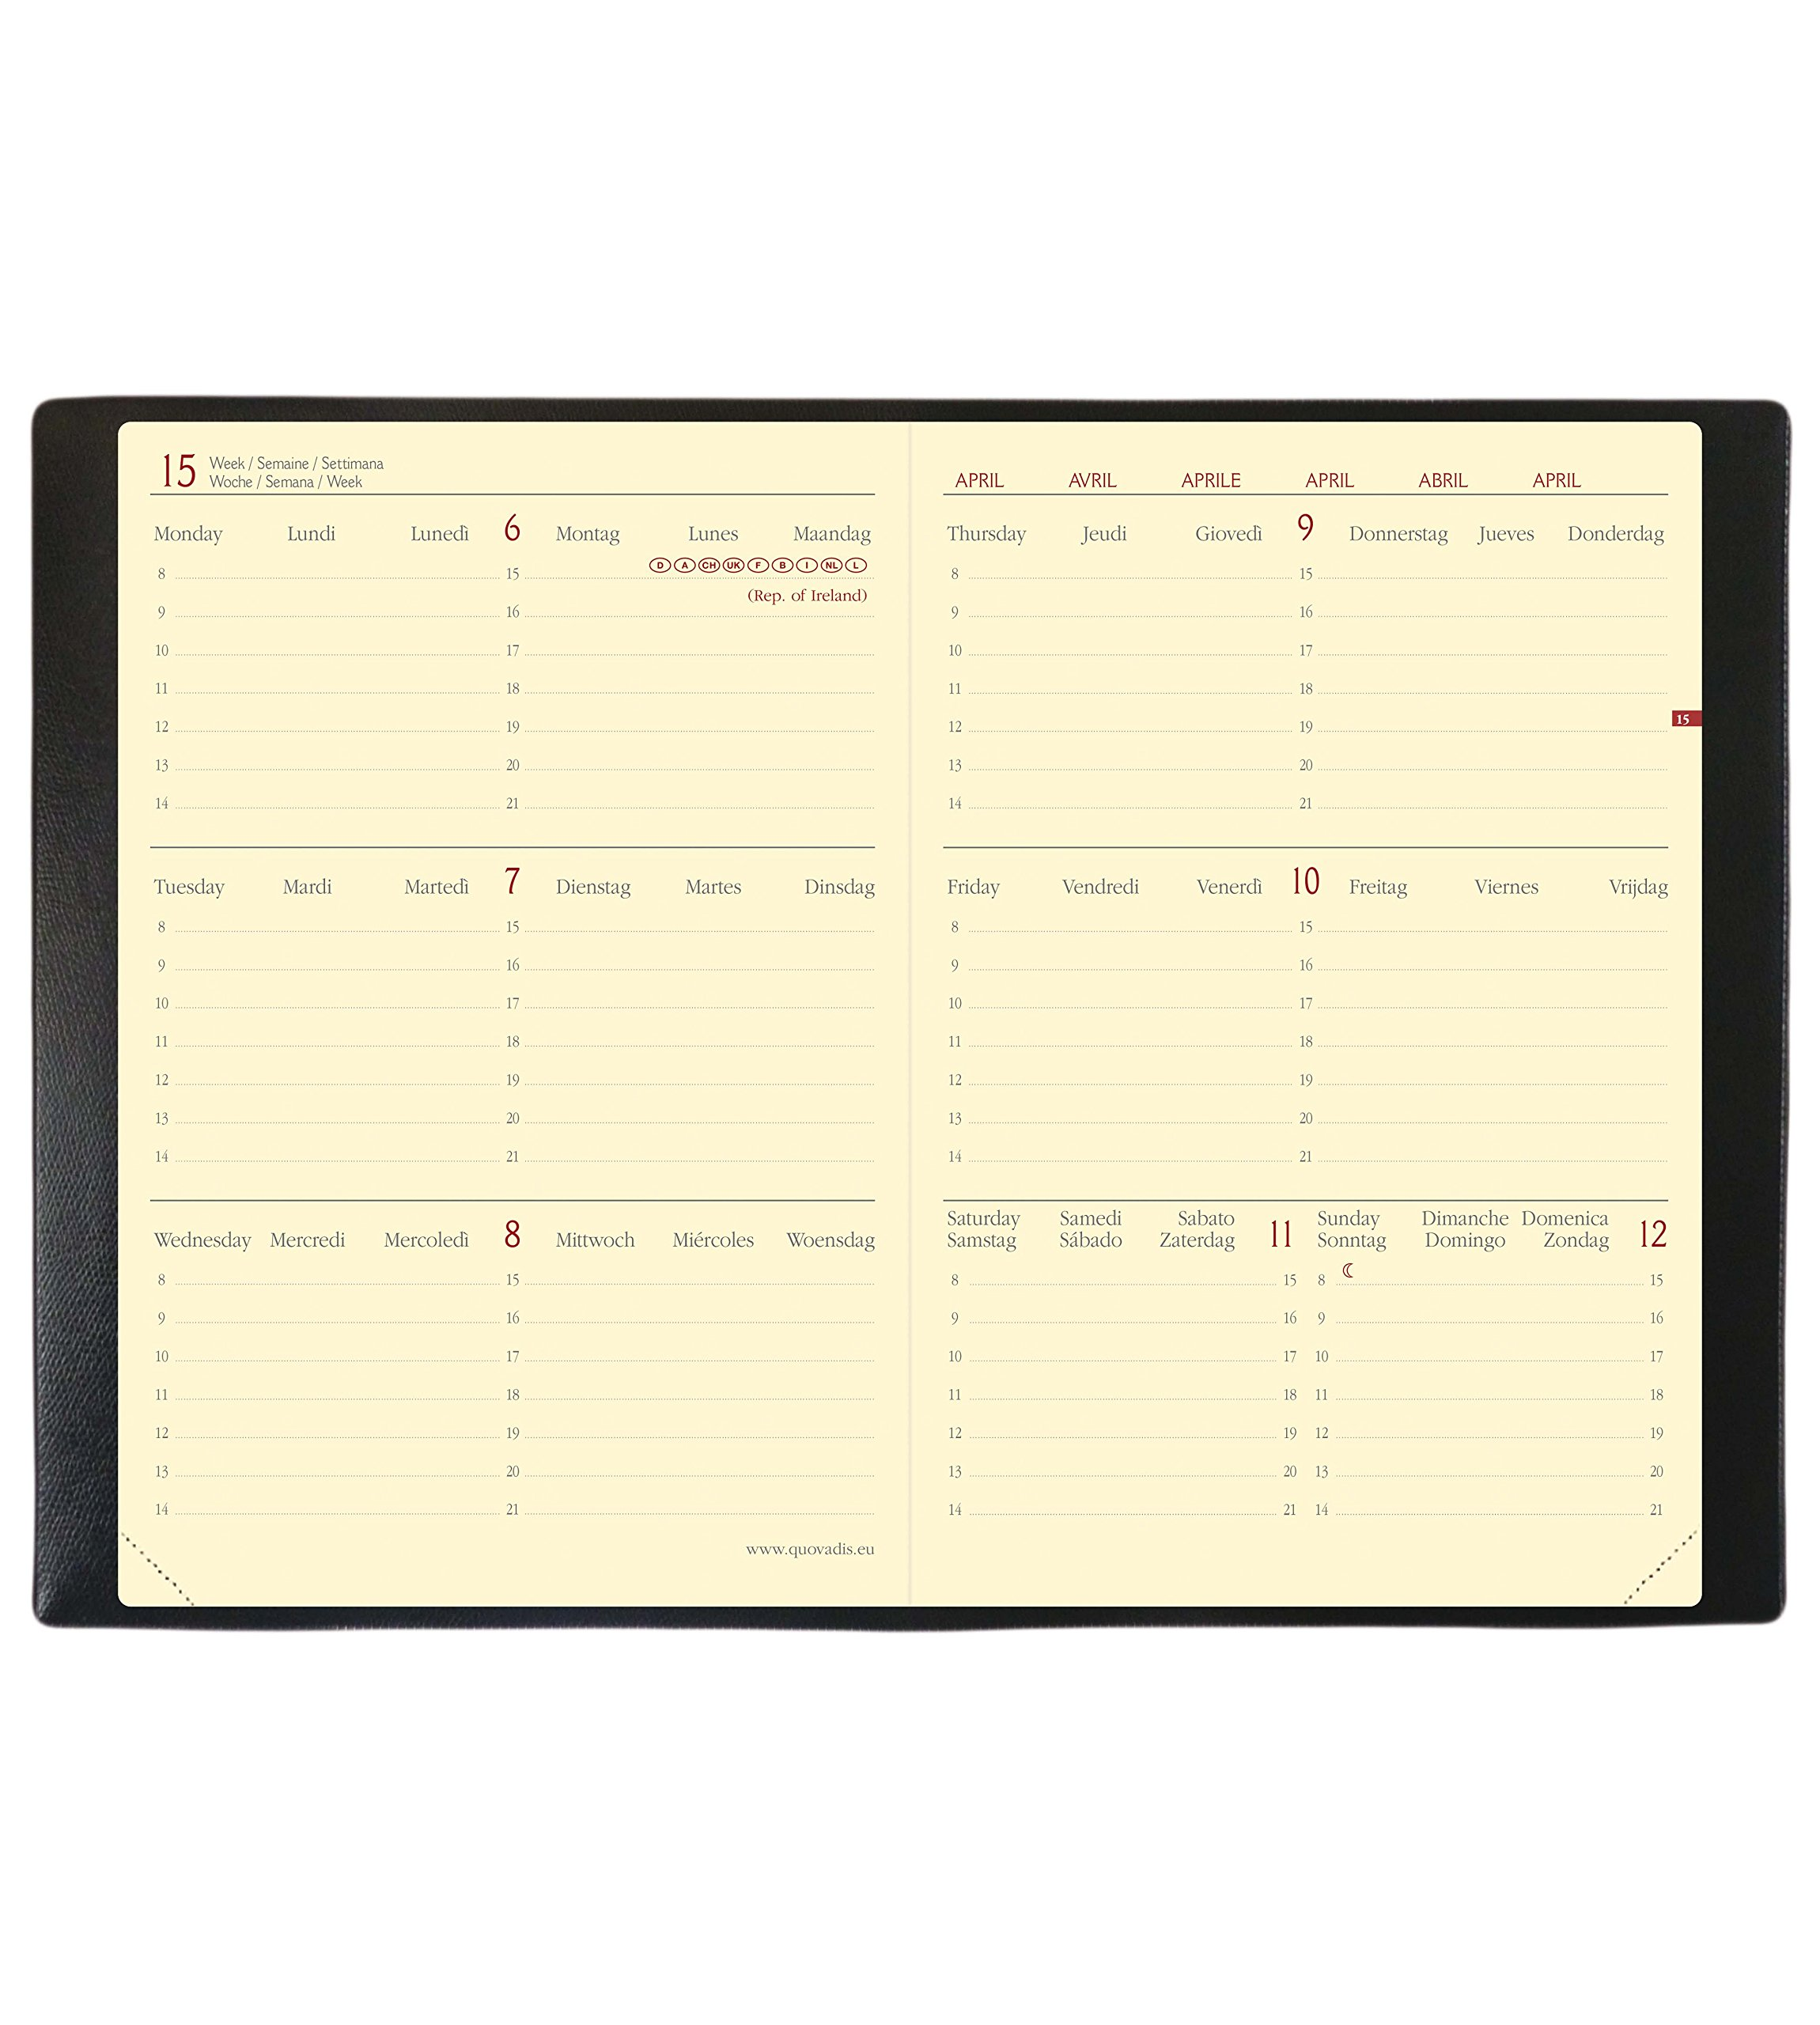 Quo Vadis Horizontal Velvet 15 SD September to December 549008q Academic Diary Year Diary with Elastic 10 x 15 cm 2017-2018 - Velvet Black by Quo Vadis (Image #7)